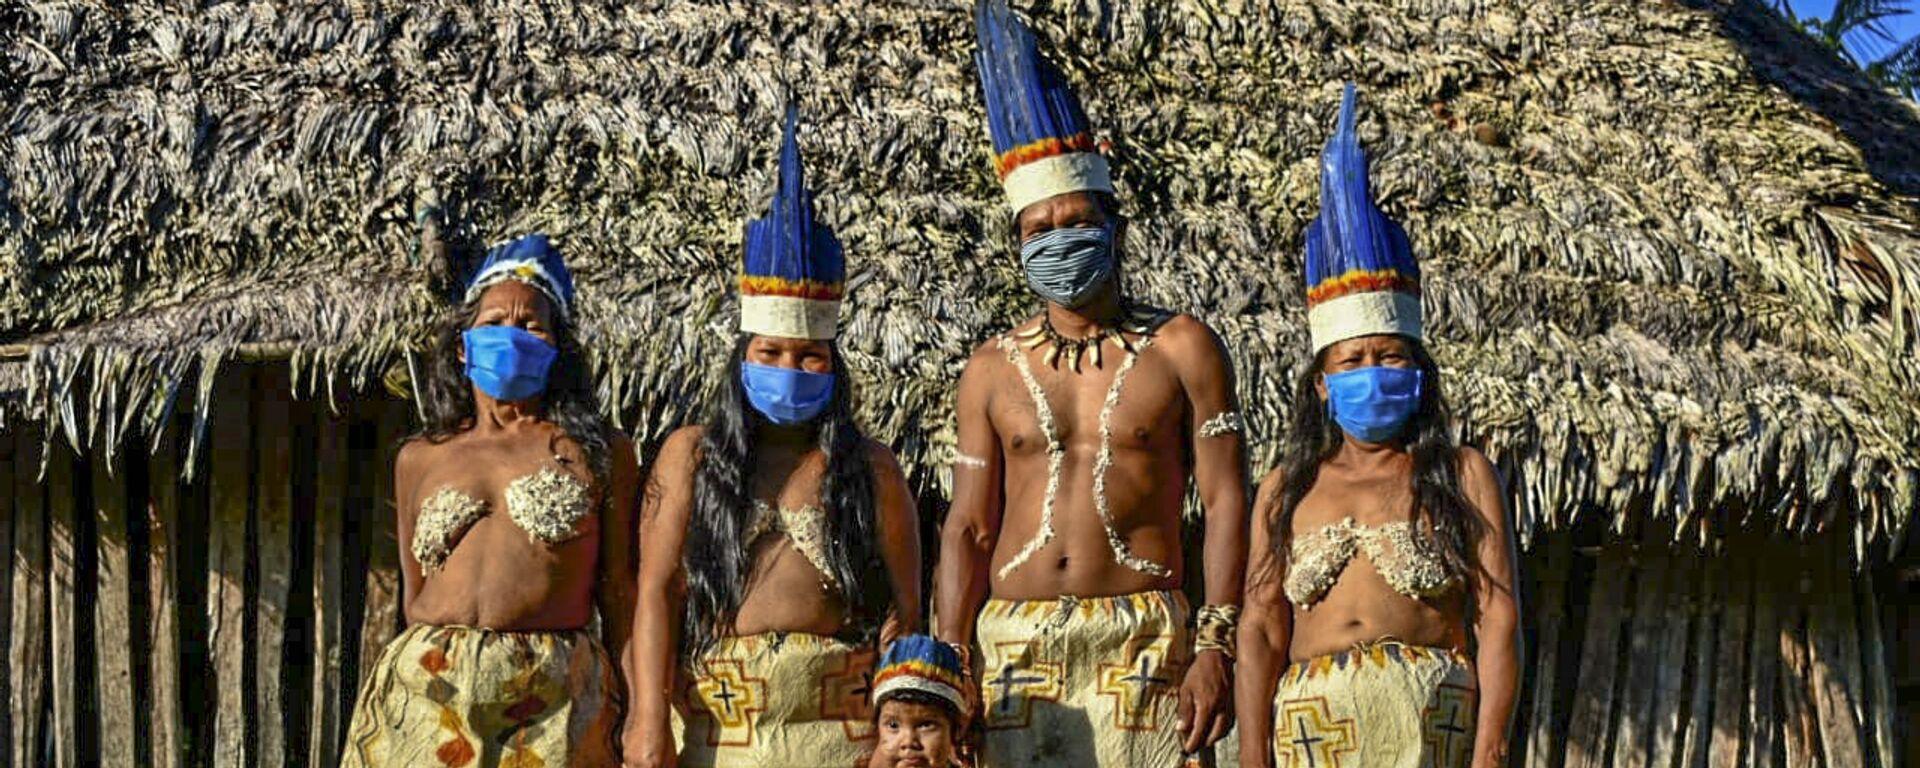 Indígenas colombianos - Sputnik Mundo, 1920, 21.04.2021